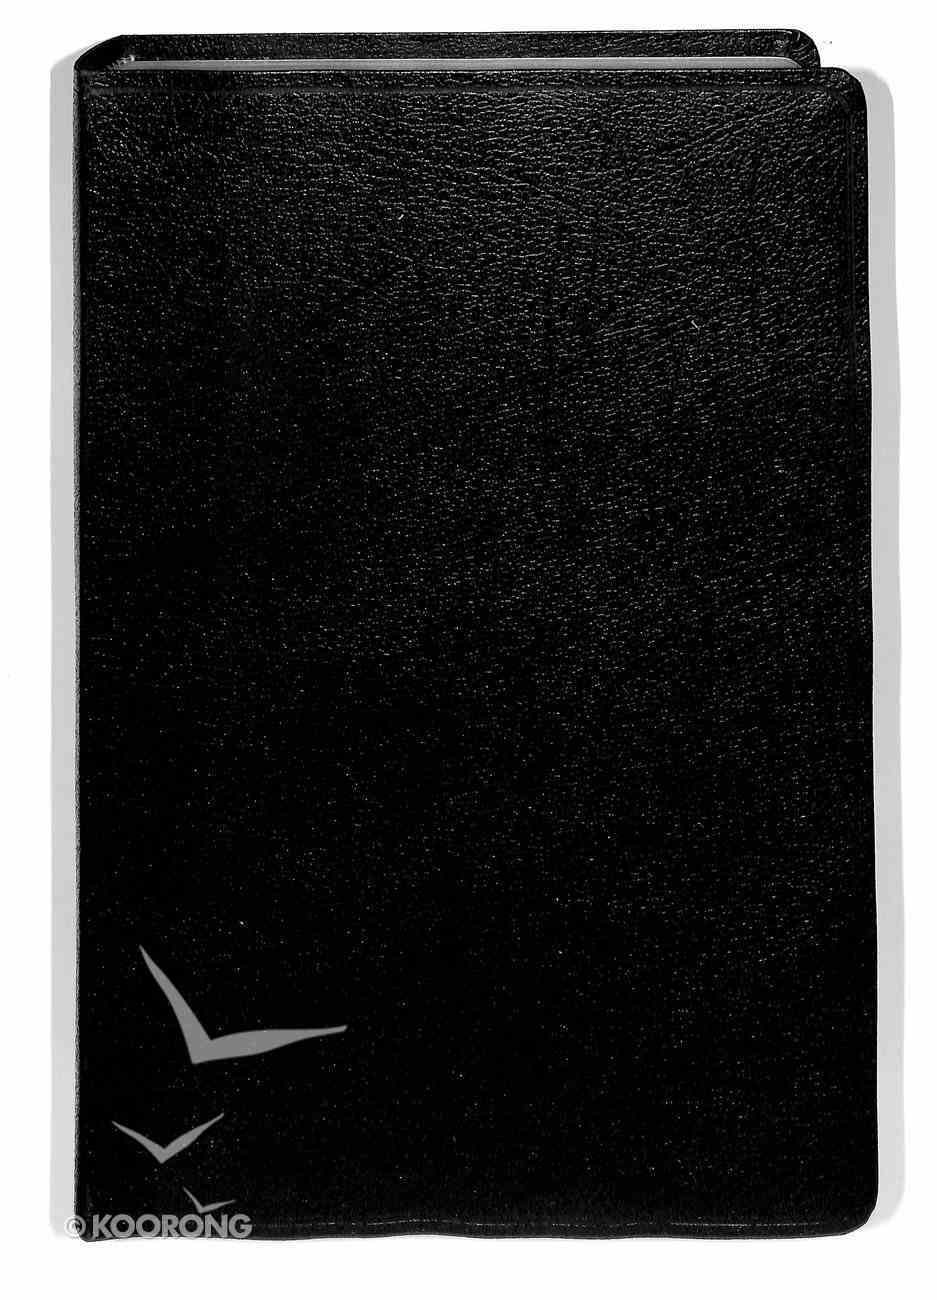 Kjv/Amp Parallel Bible (Kjv Red Letter, Amp Black Letter) Bonded Leather